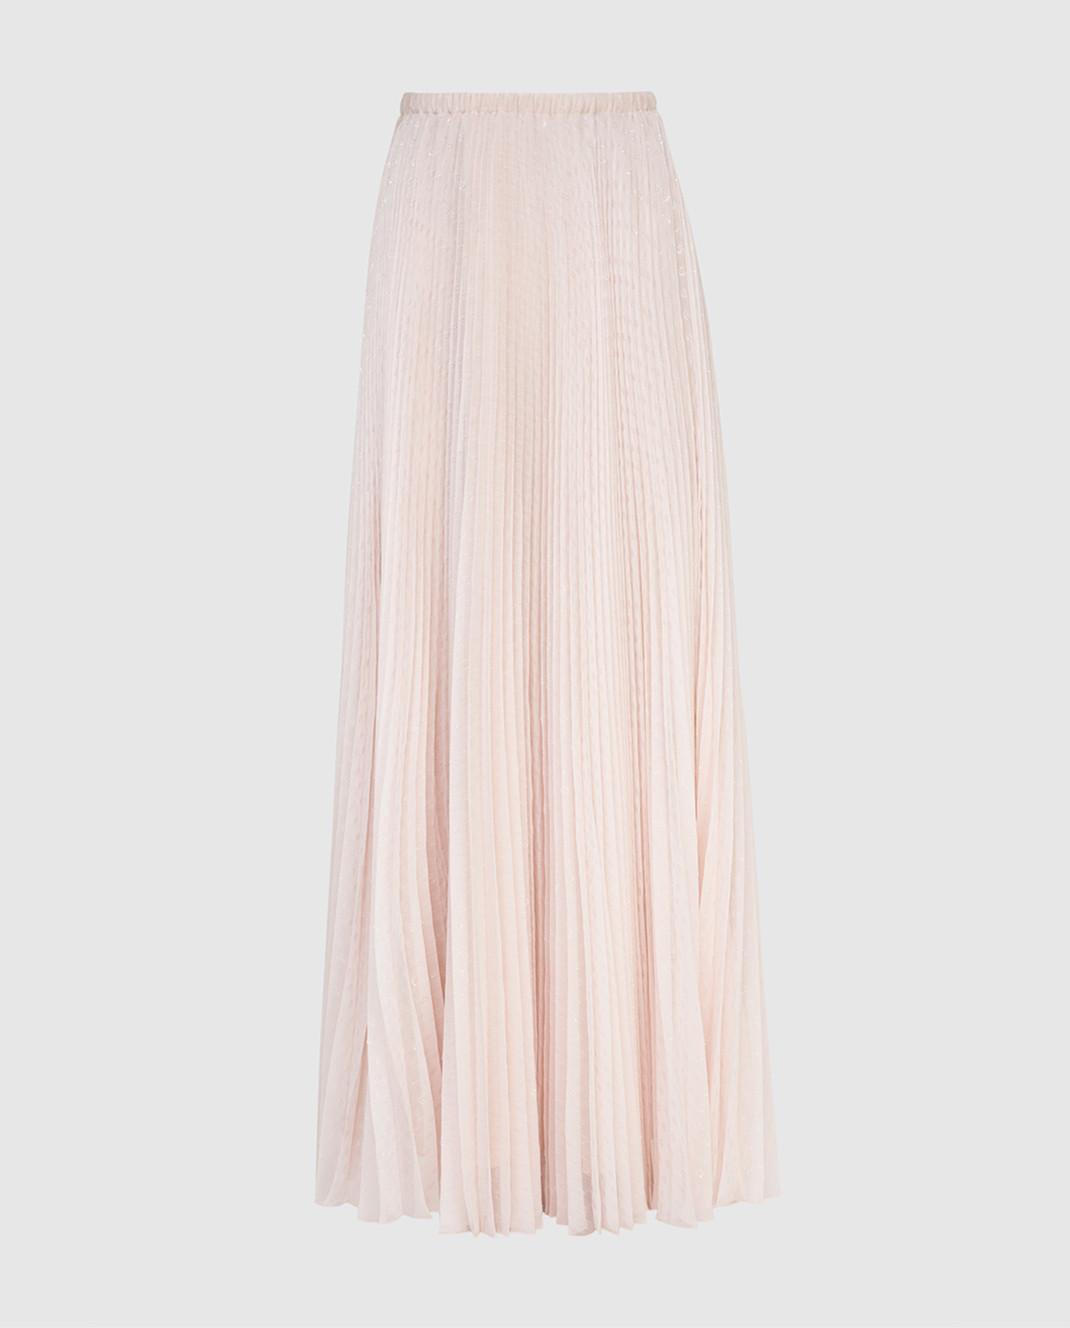 Philosophy di Lorenzo Serafini Светло-розовая юбка изображение 1